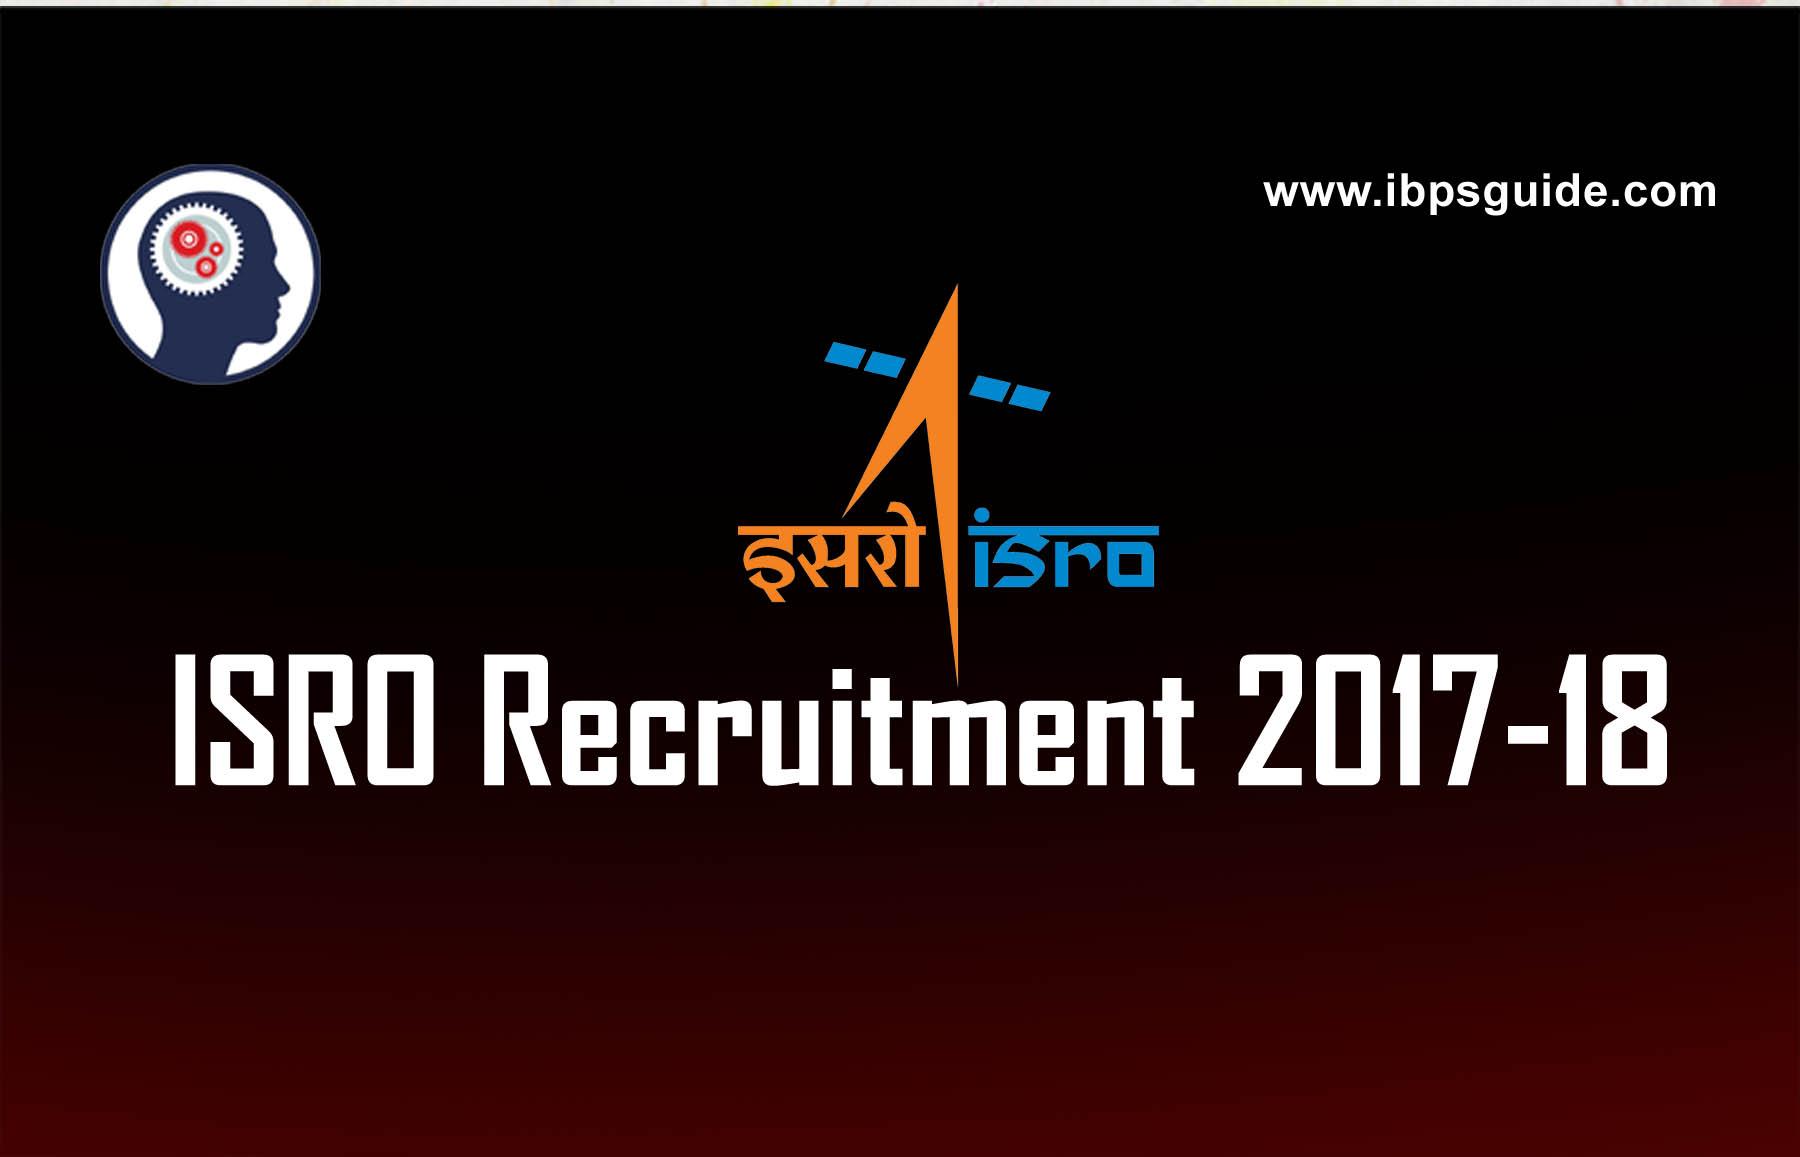 ISRO Recruitment 2018 |Apply for various vacancies